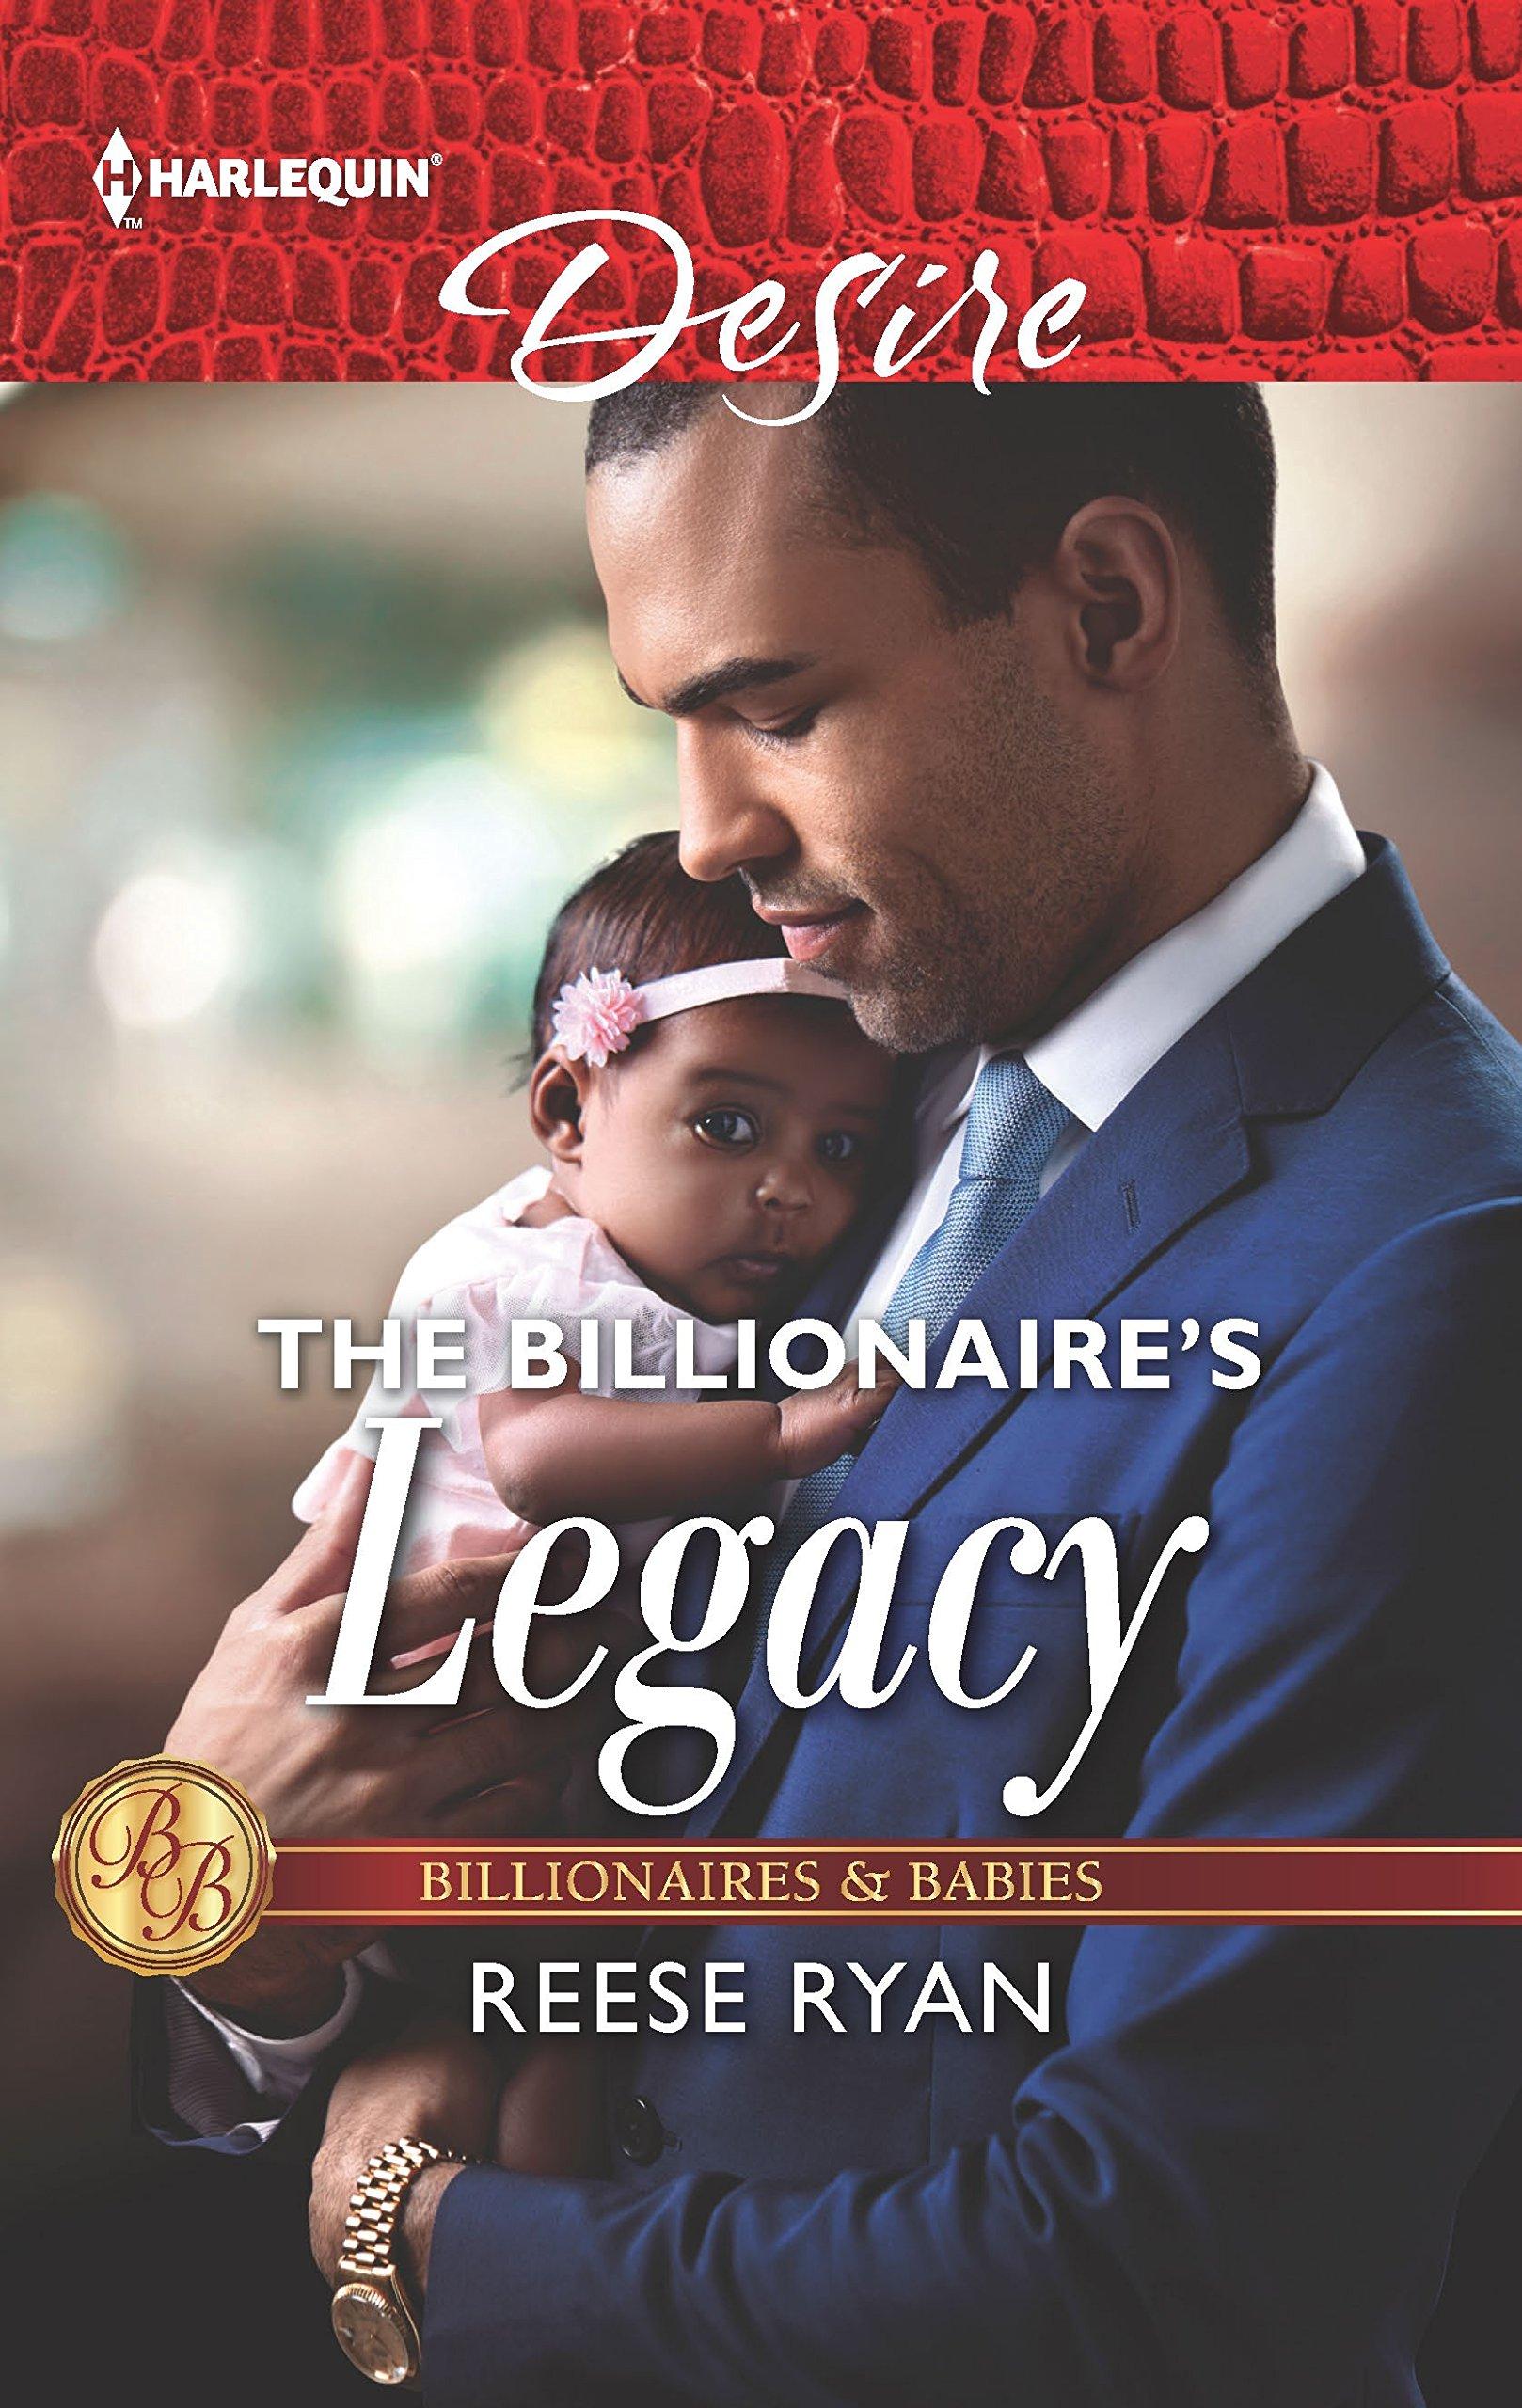 Amazon.com: The Billionaire's Legacy (Billionaires and Babies)  (9781335971784): Reese Ryan: Books